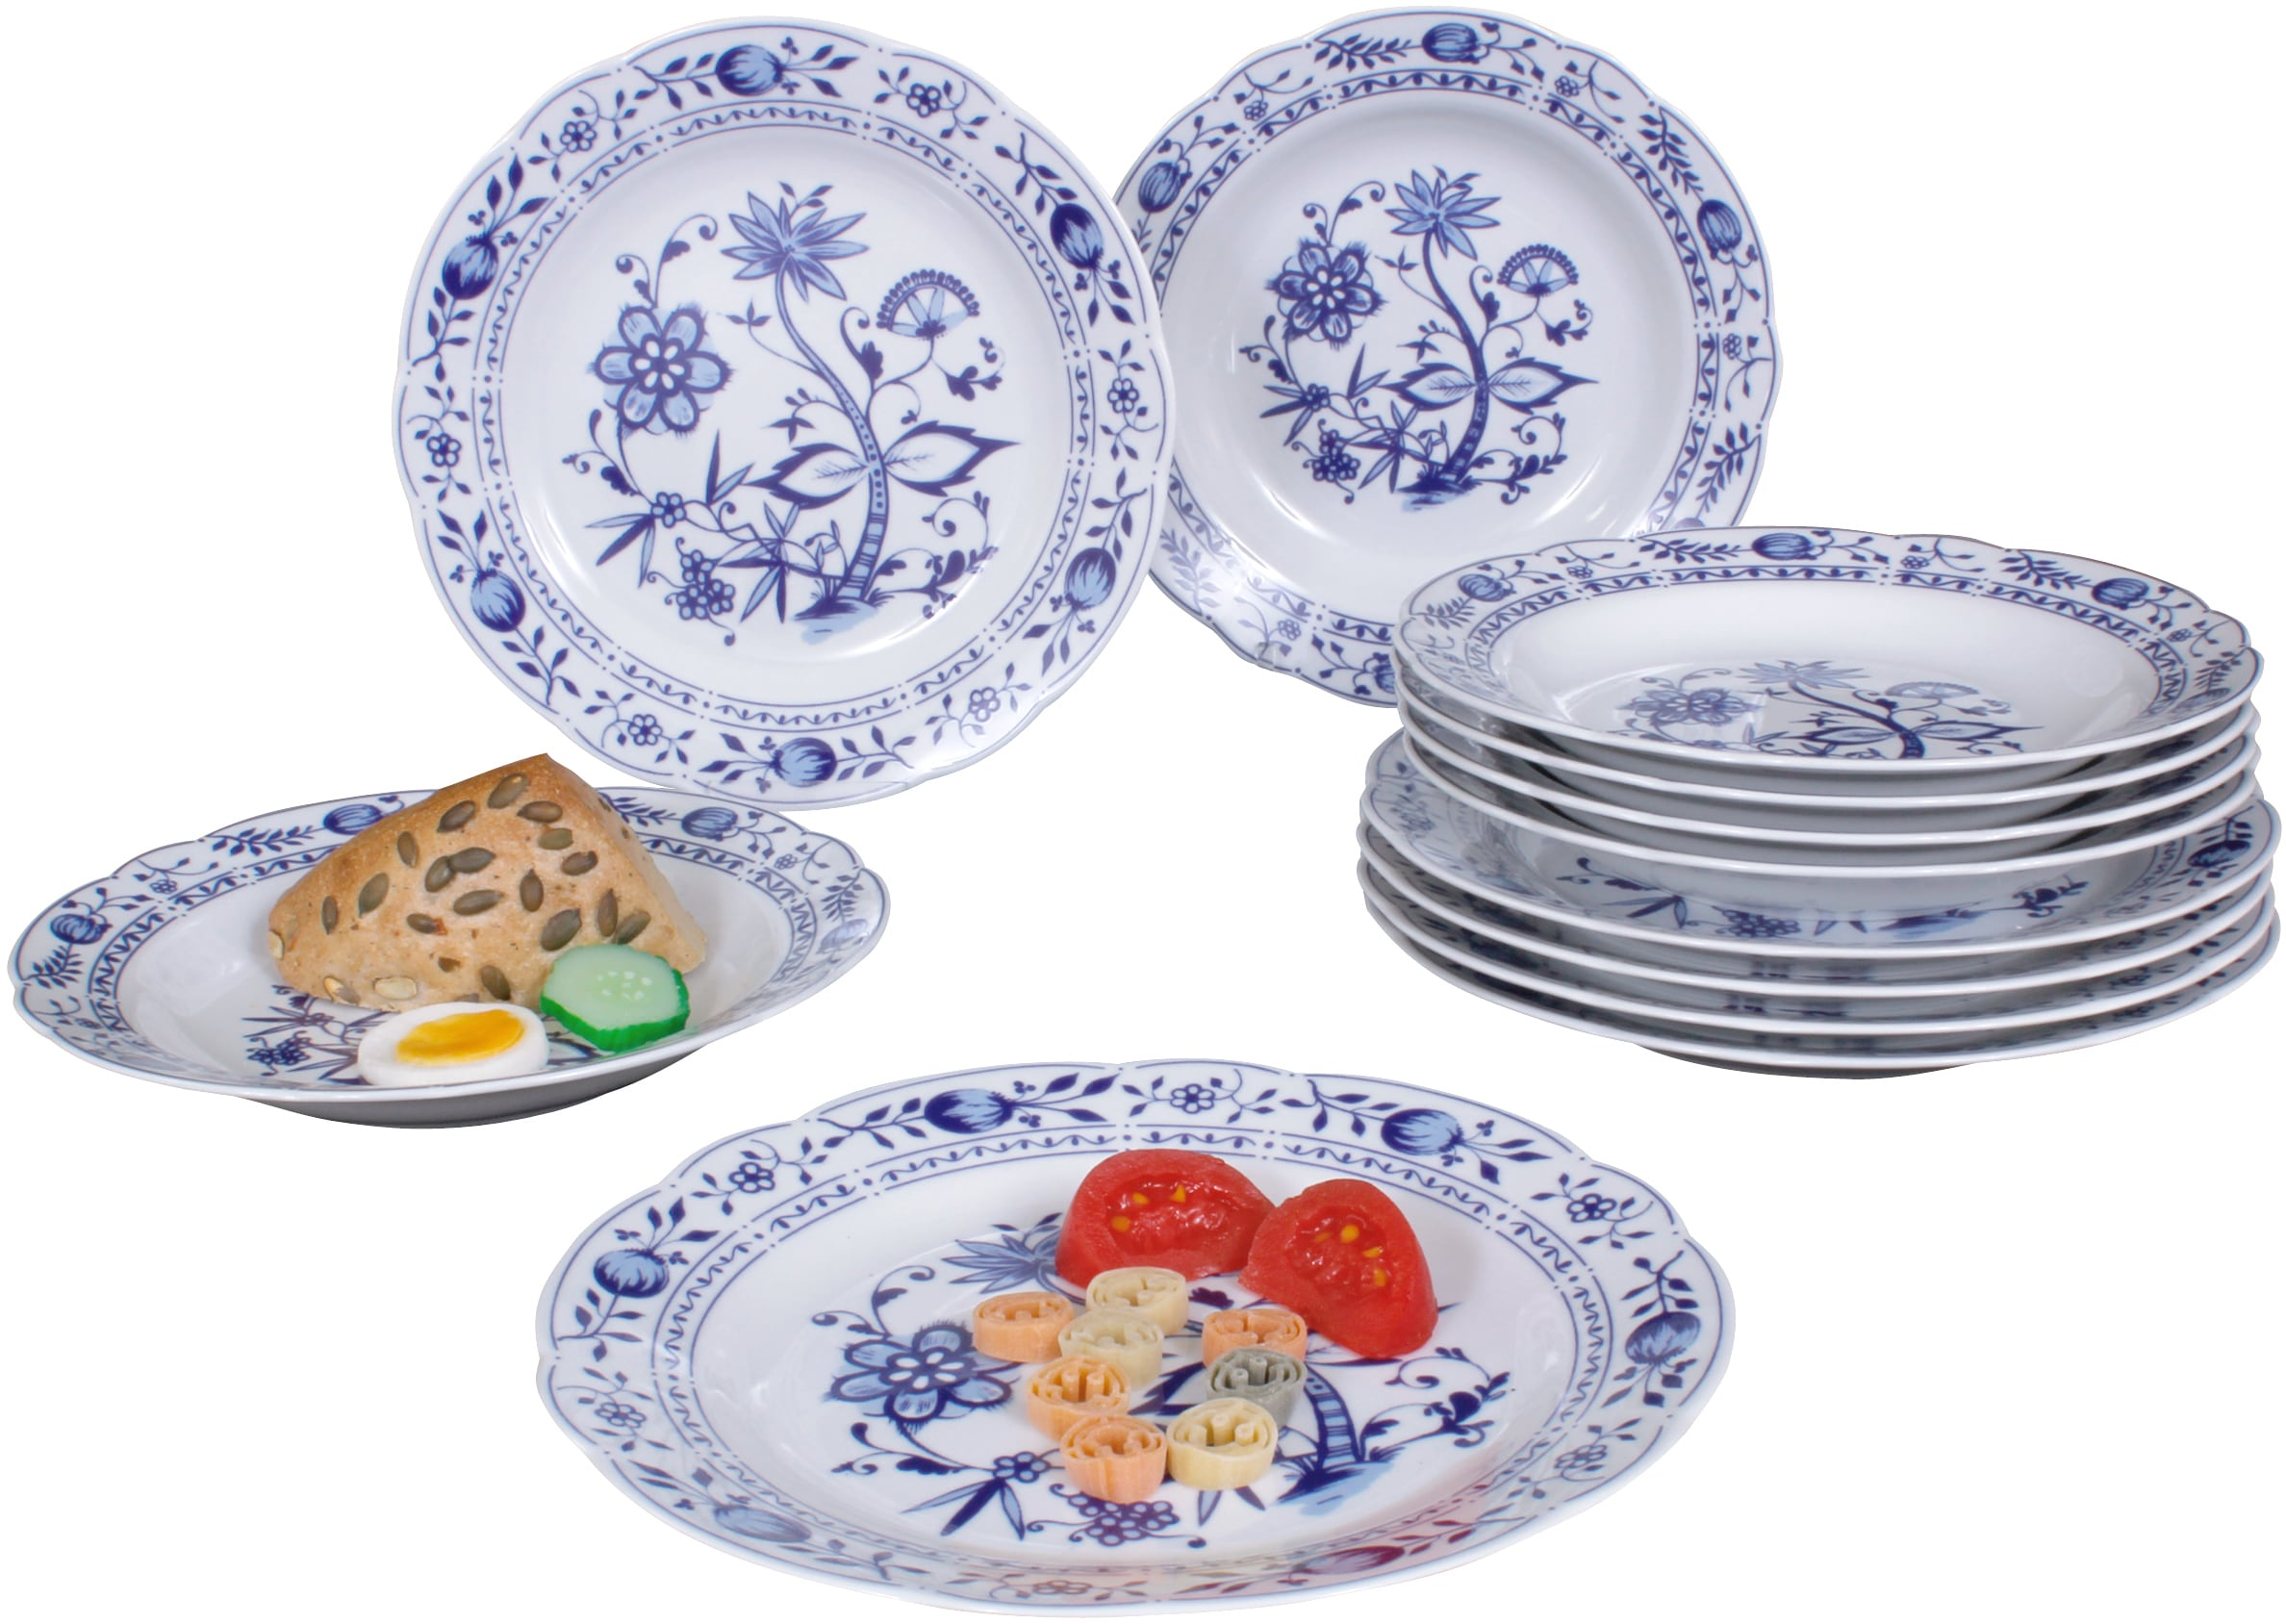 Eschenbach Tafelservice Romantika - Zwiebelmuster, (12 tlg.), Made in Germany weiß Geschirr-Sets Geschirr, Porzellan Tischaccessoires Haushaltswaren